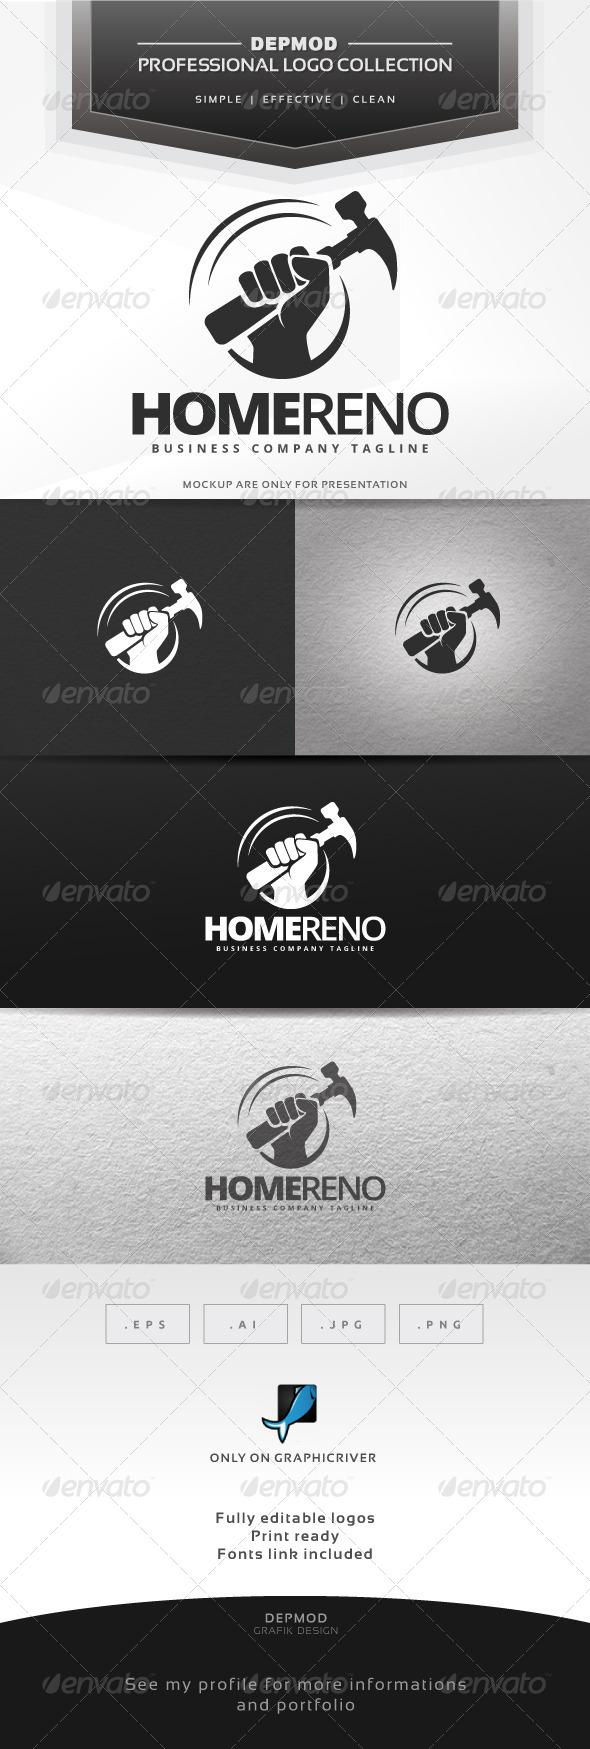 GraphicRiver Home Reno Logo 7066660